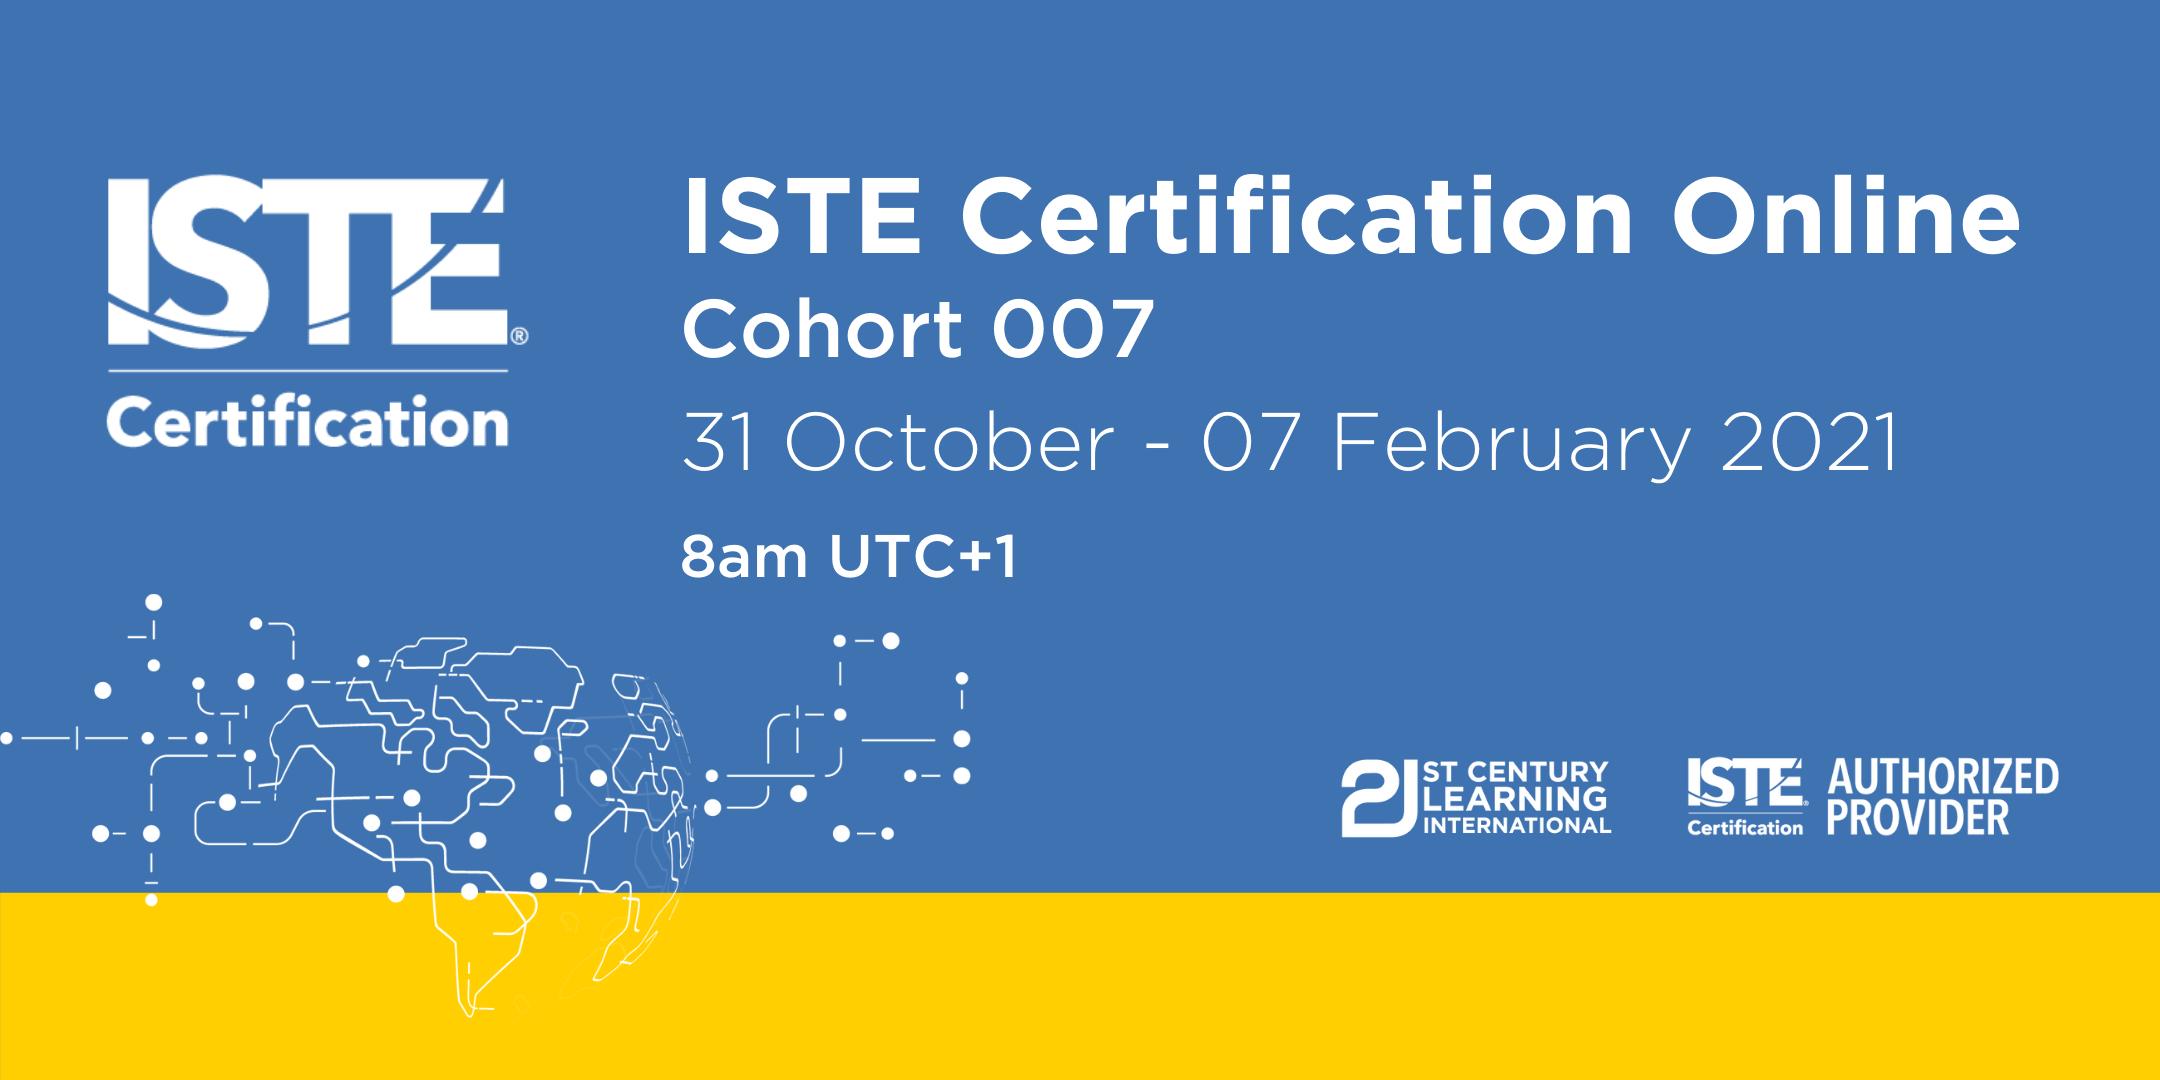 ISTE Certified Educator - Cohort 007